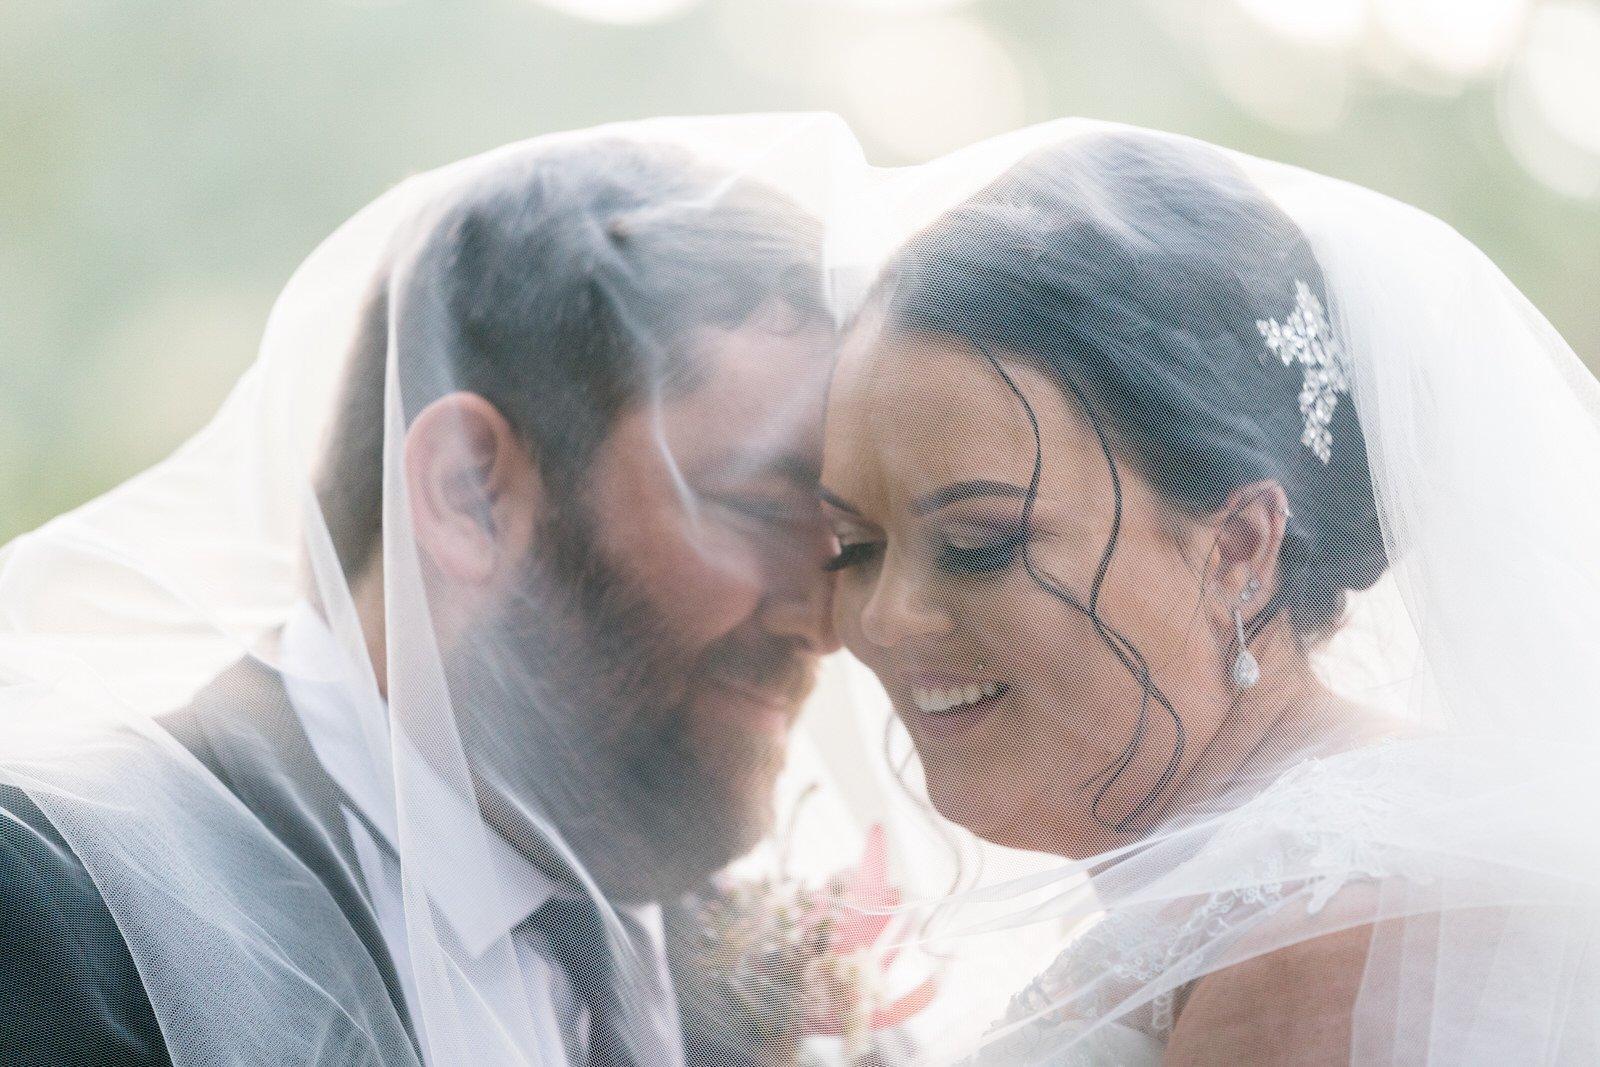 Chateau Wyuna Mount Evelyn | Lauren & Harry's Wedding